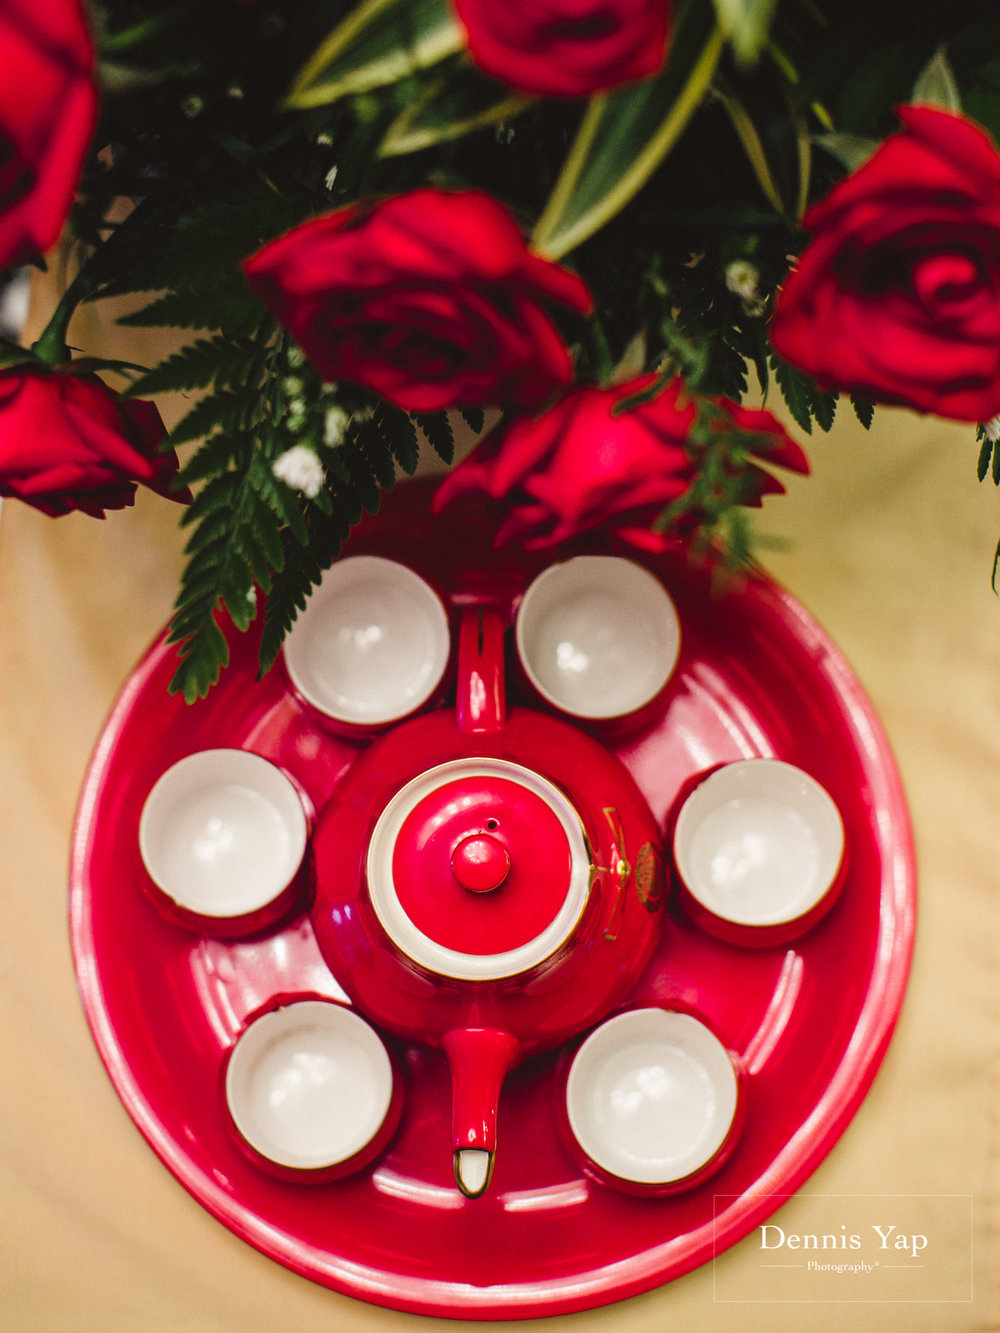 Frederik E Hun Traditional Chinese Wedding belgium malaysia wedding dennis yap photography malaysia wedding photographer pin hua inti college president-3.jpg